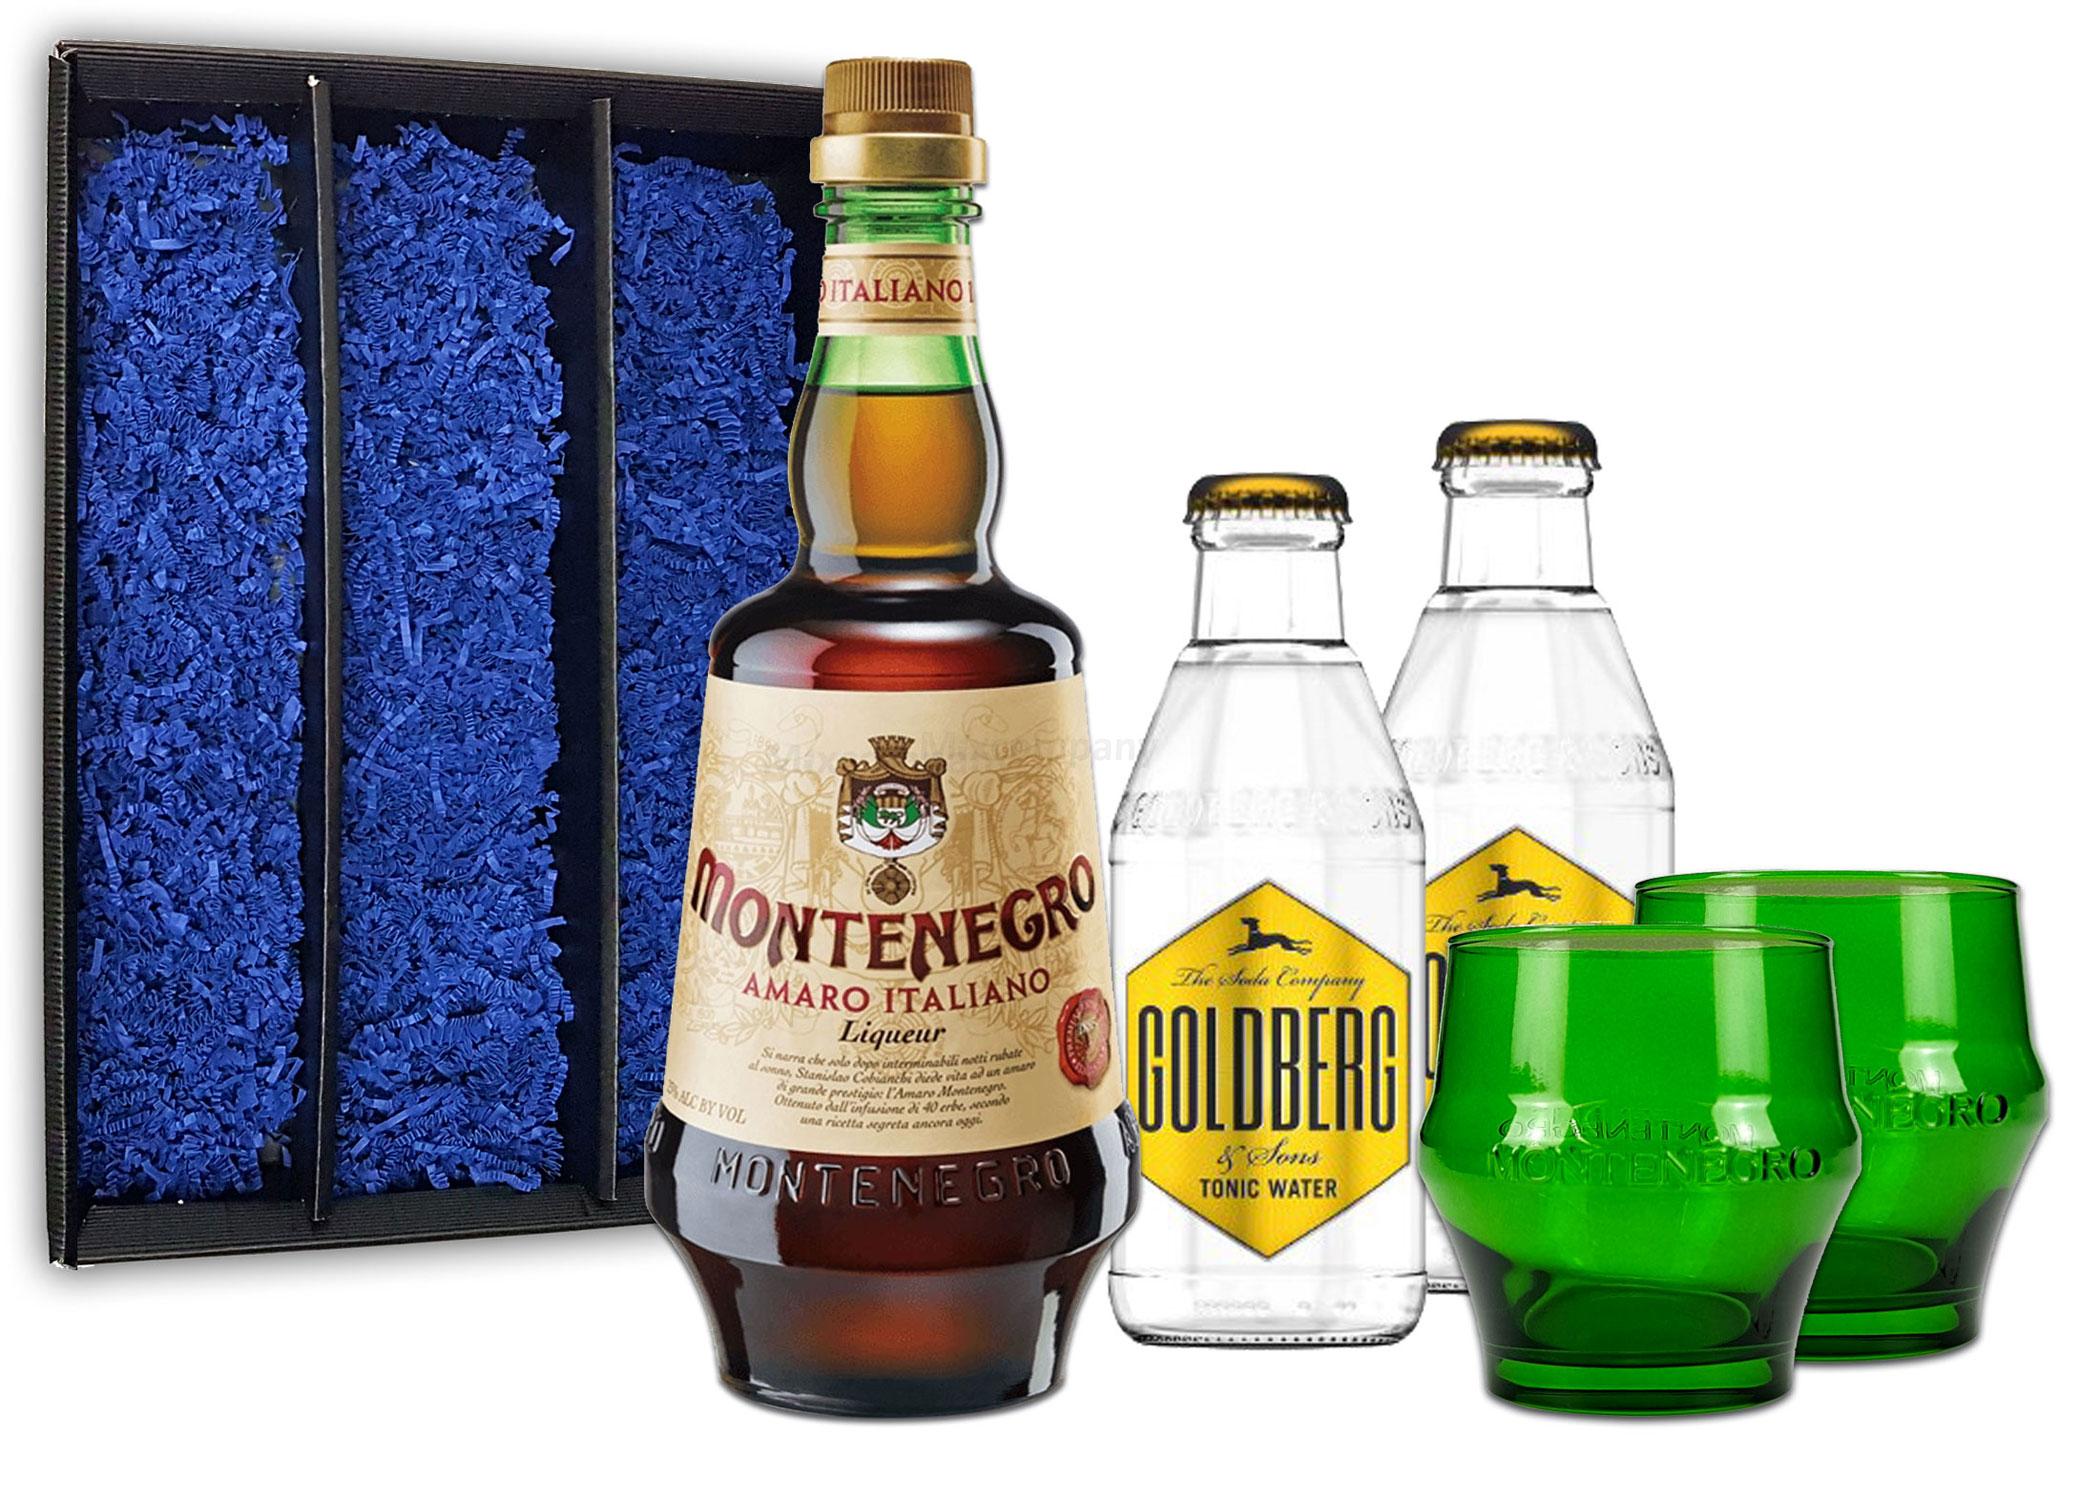 Montenegro & Tonic Geschenkset - Montenegro Amaro Italiano Likör 0,7L (23% Vol) + 2x Goldberg Tonic Water 200ml inkl. Pfand MEHRWEG + 2x Gläser Shot Glas grün